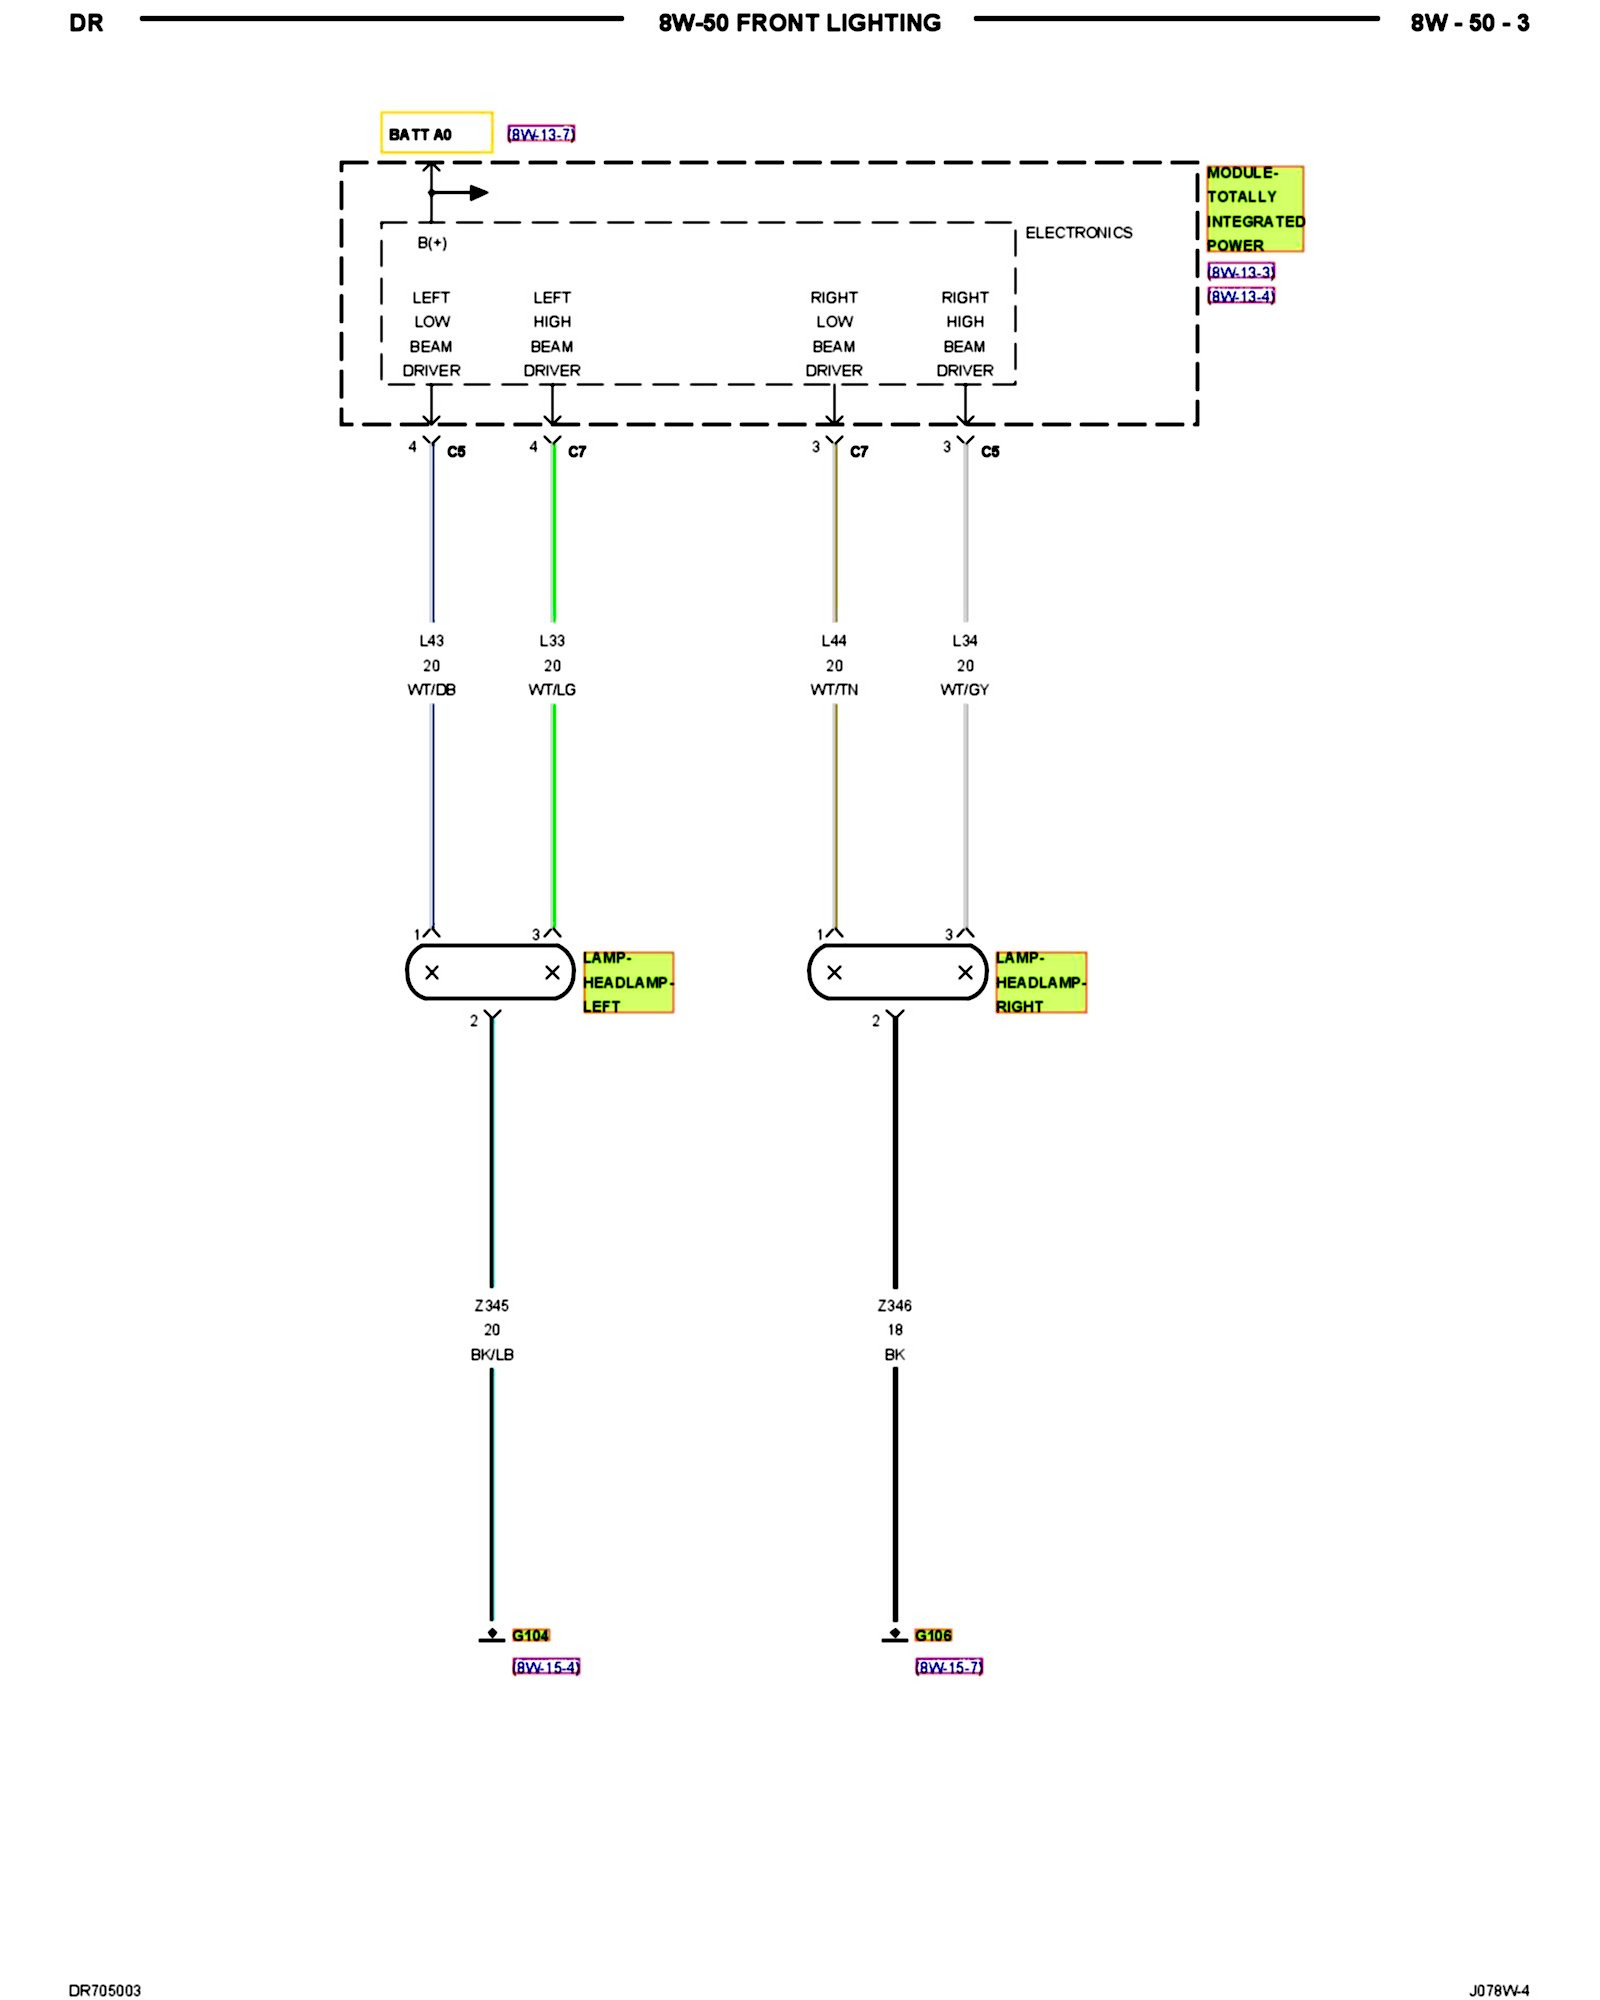 2016 Ram 2500 Wiper Wiring Diagram Diagram] 94 2500 Headlight Diagram Full Version Hd Quality … Of 2016 Ram 2500 Wiper Wiring Diagram